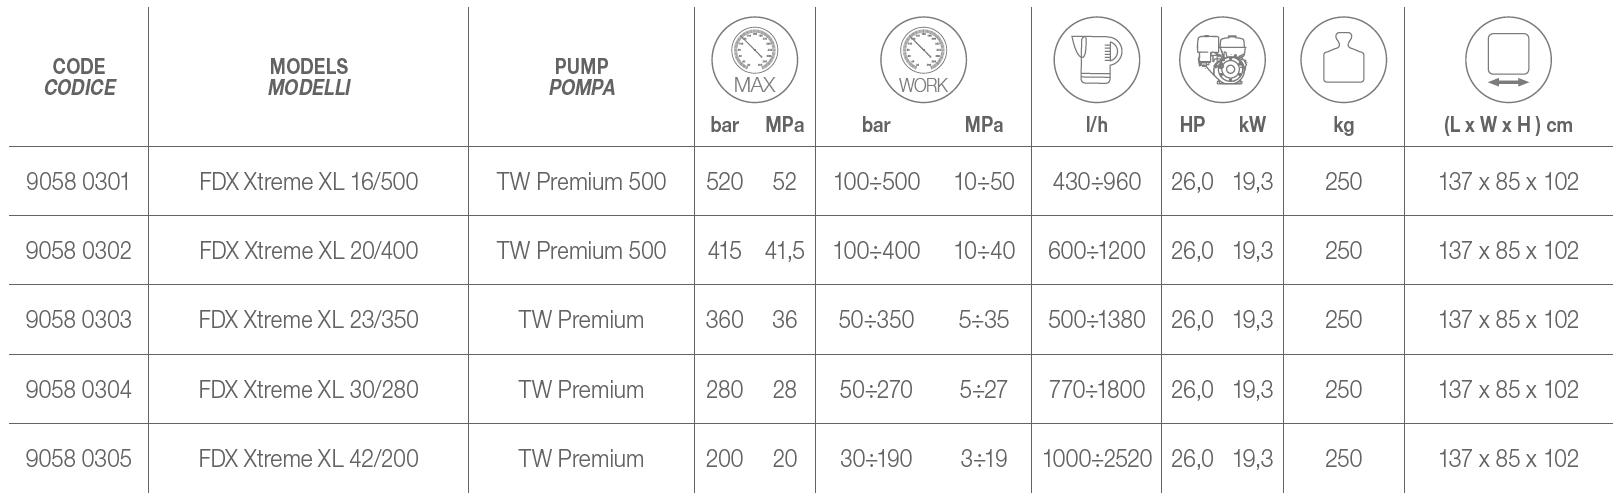 FDX XTREME XL Technical Data